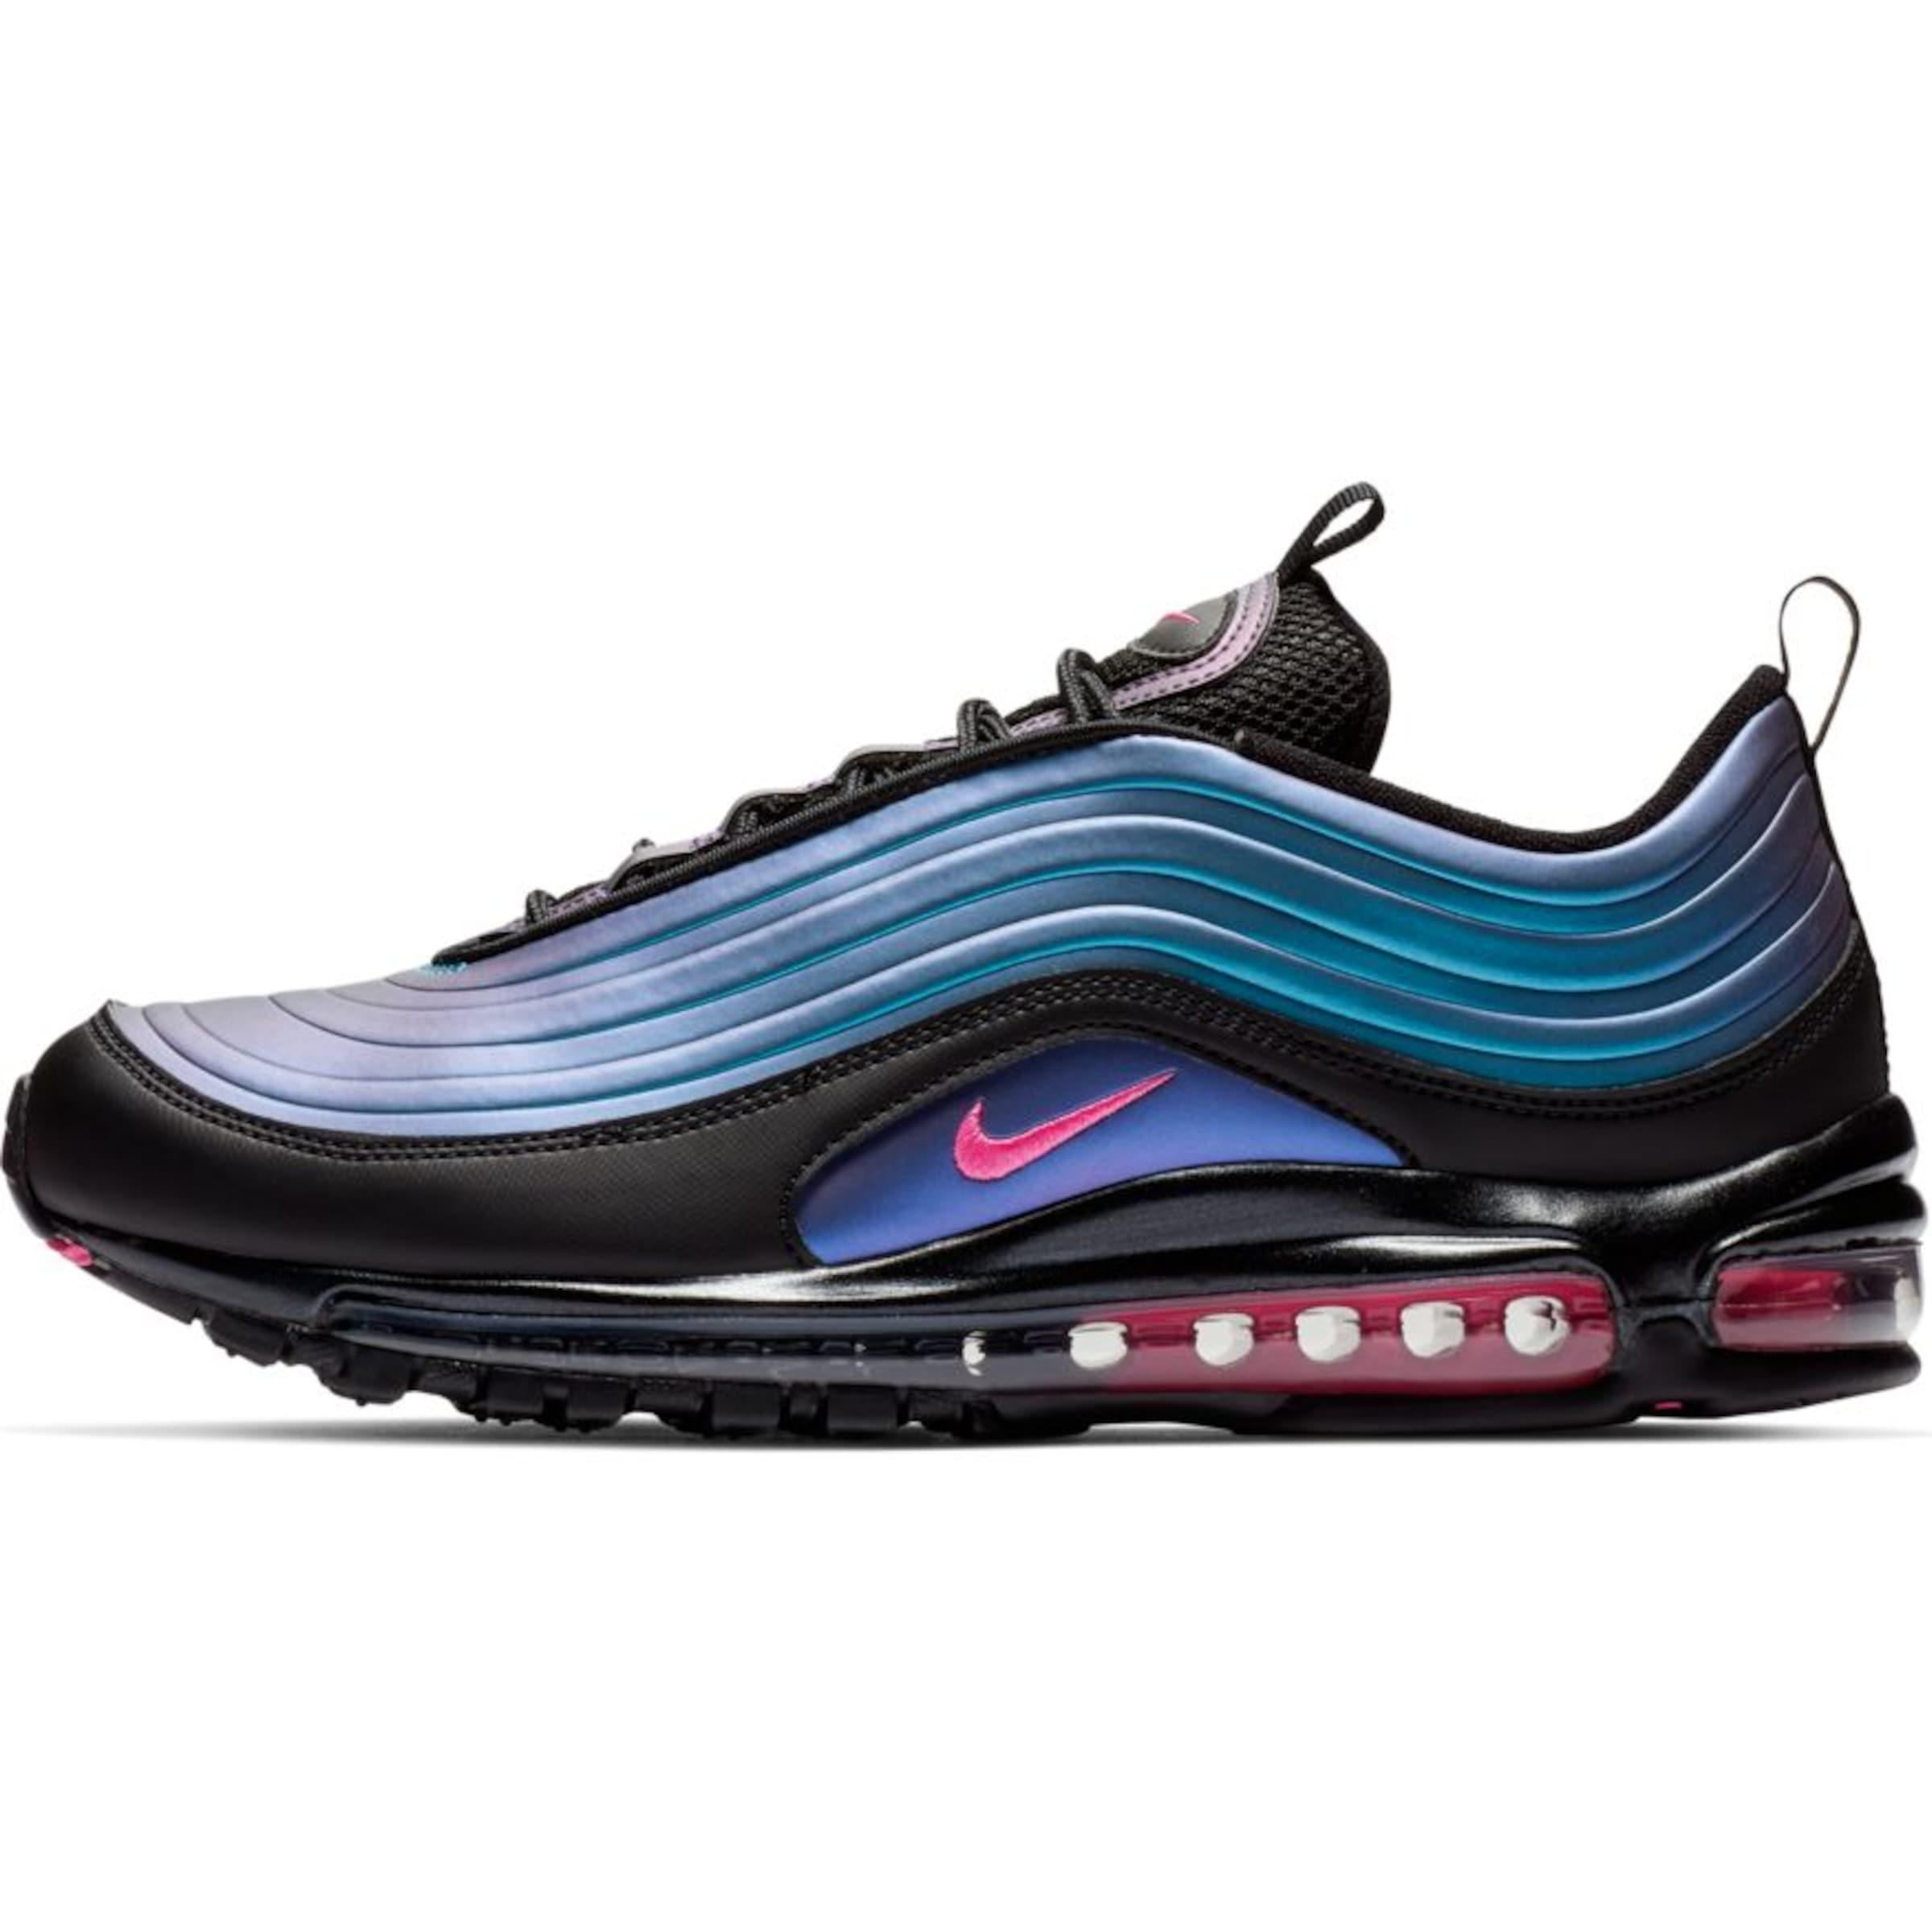 BlauPink Max 97 Nike 'air In Sportswear Lx' Sneaker Schwarz fy6Yb7gv